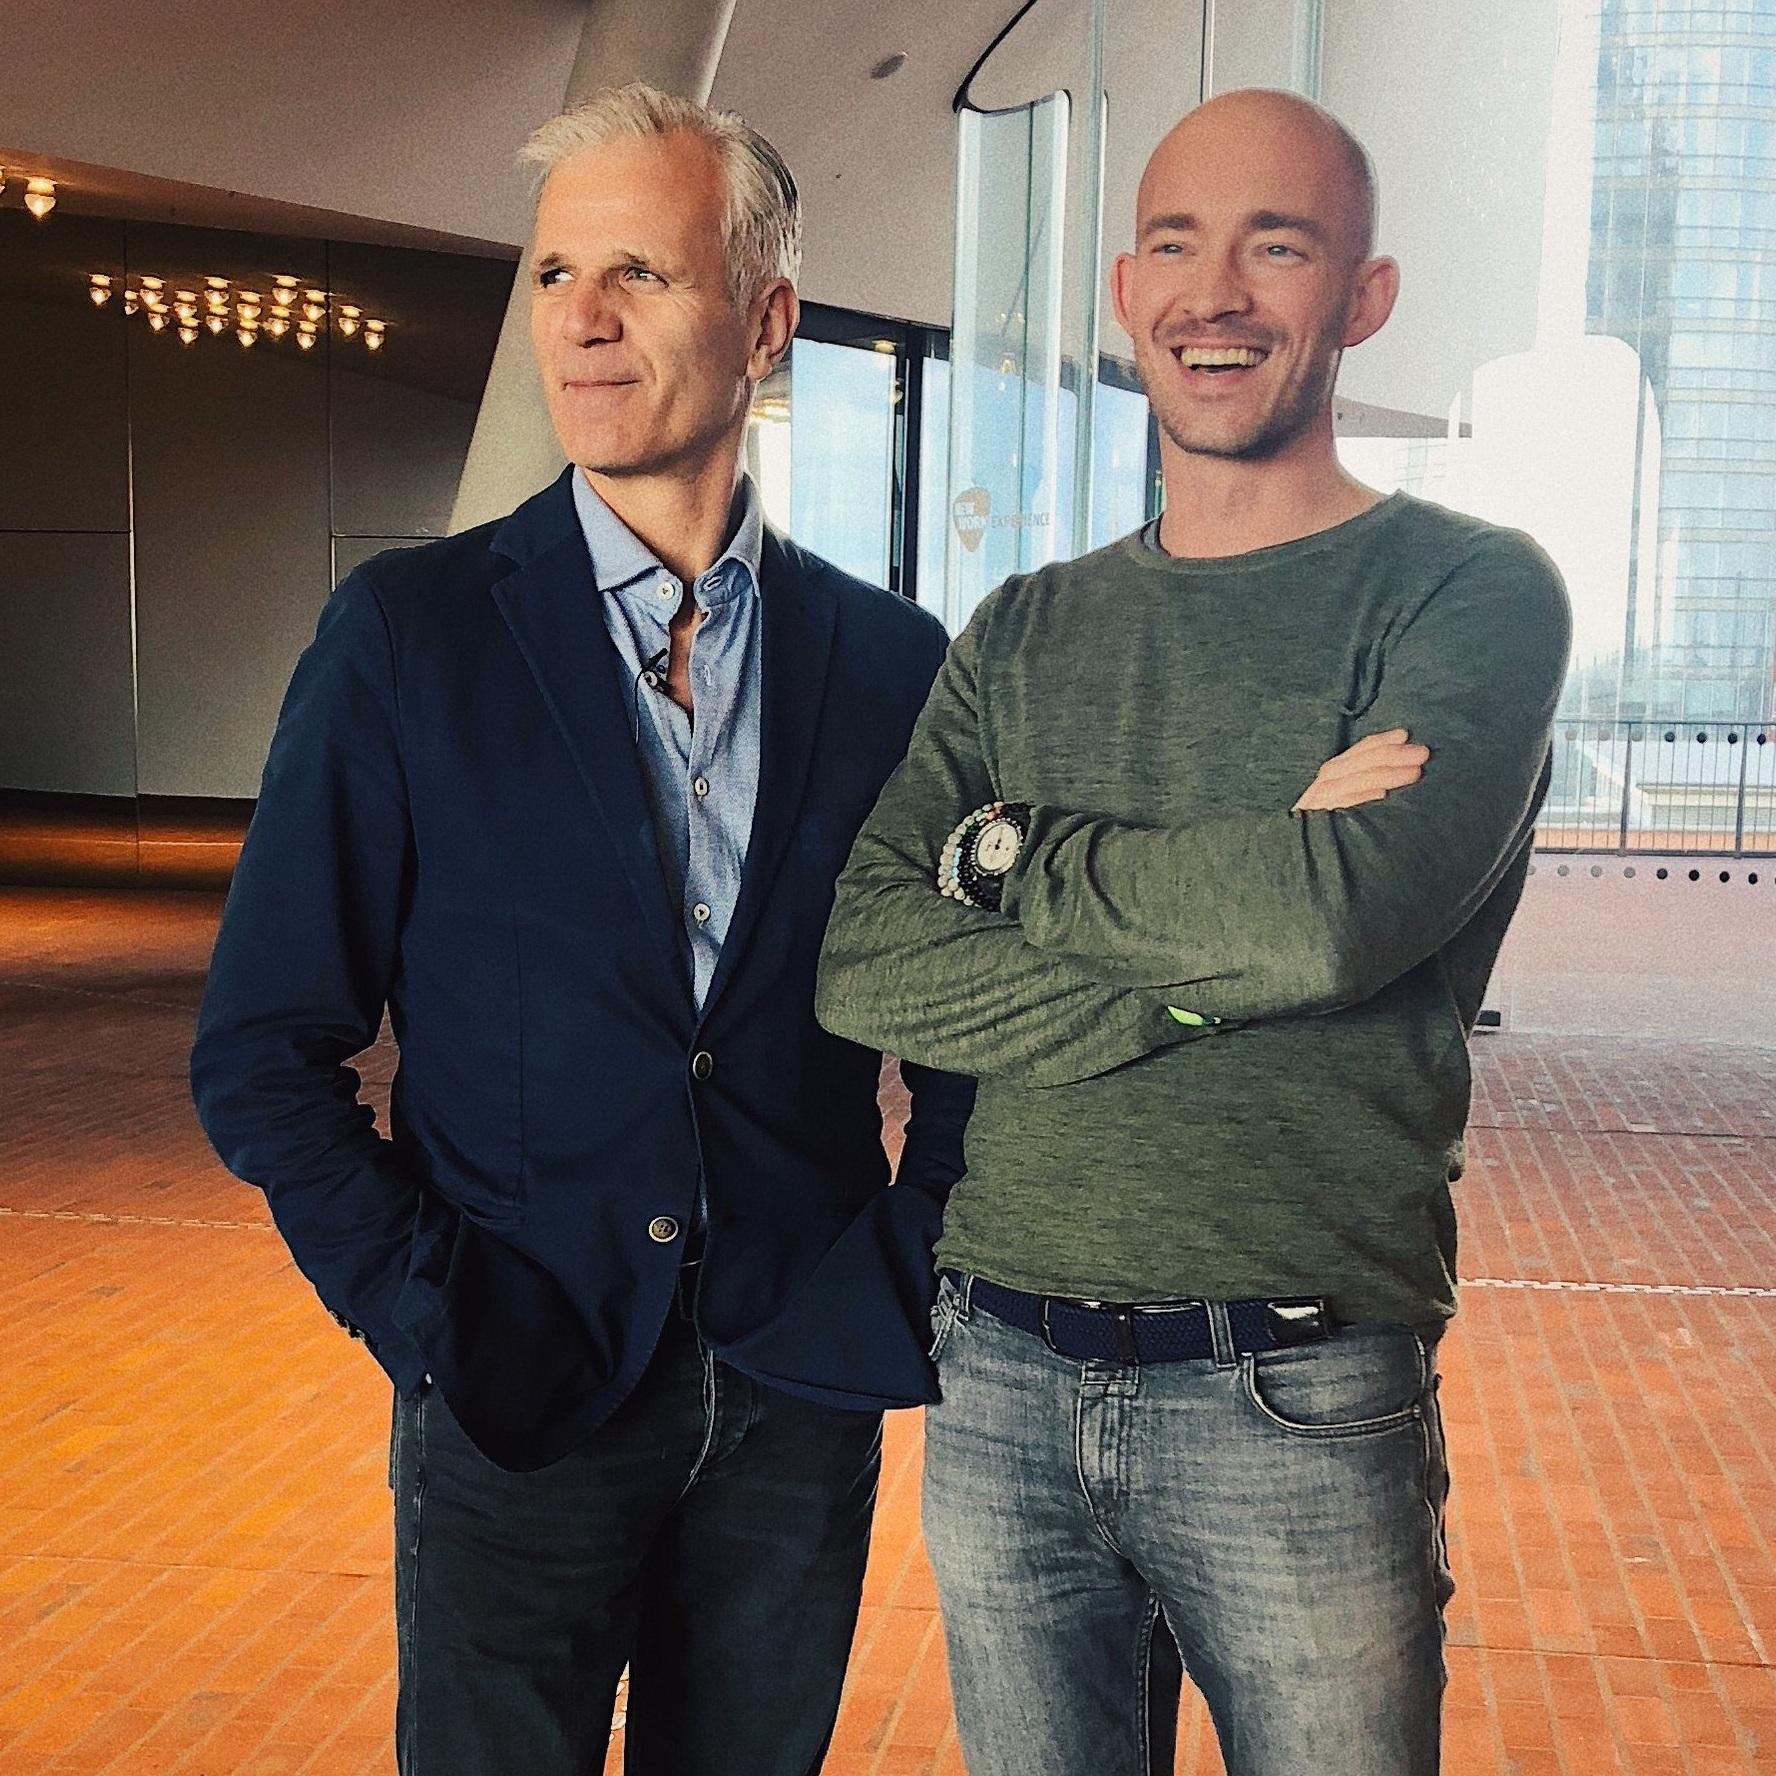 Michael Trautmann, Christoph Magnussen